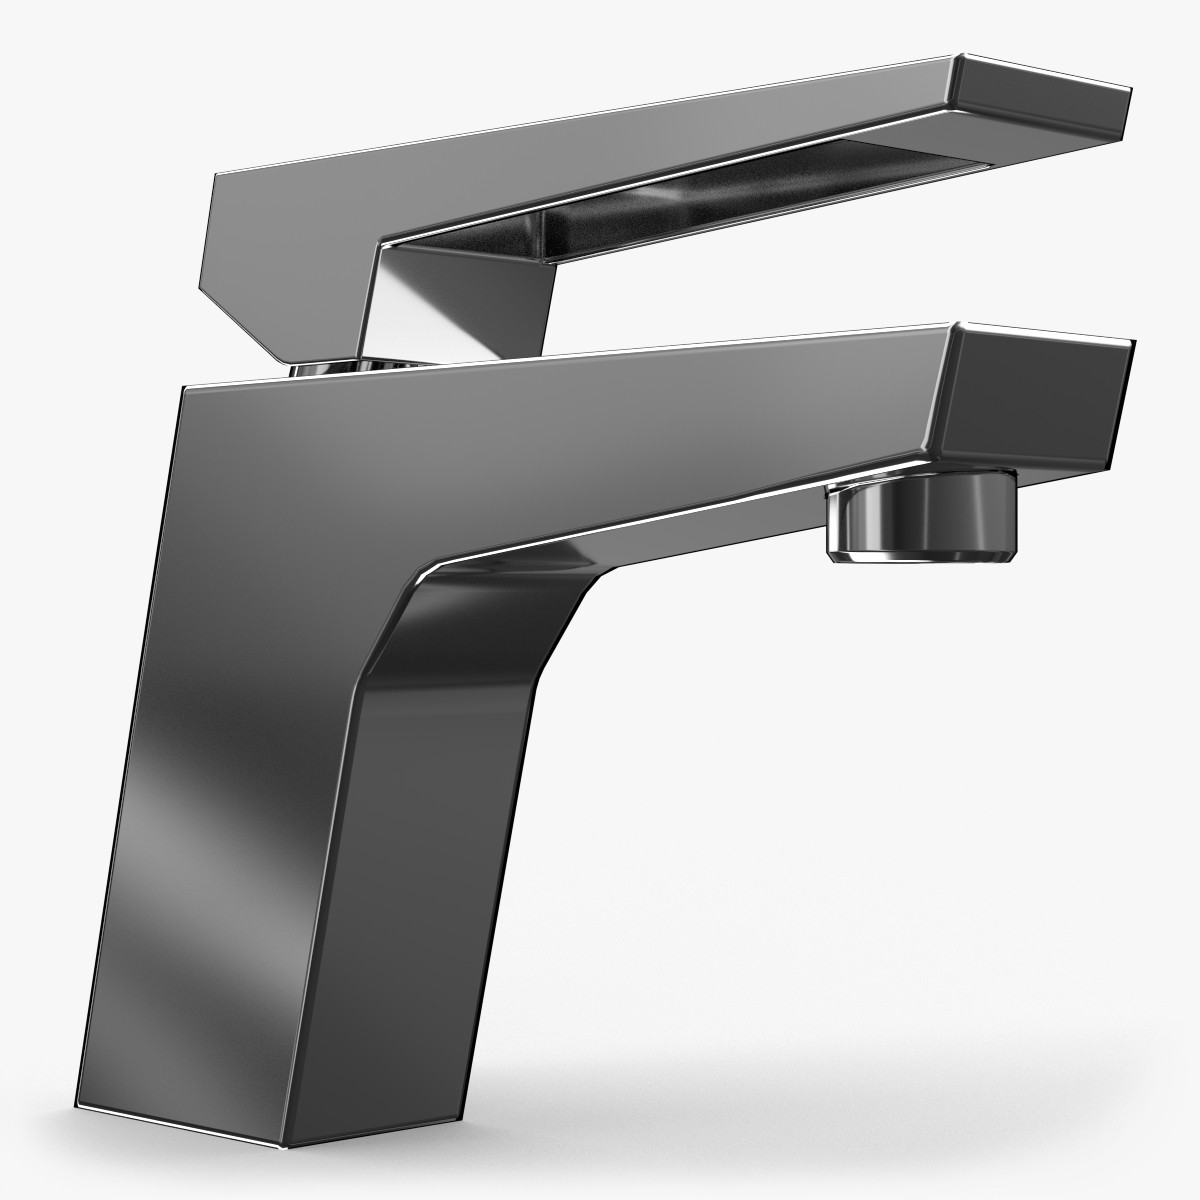 Faucet_01 - Preview.jpg